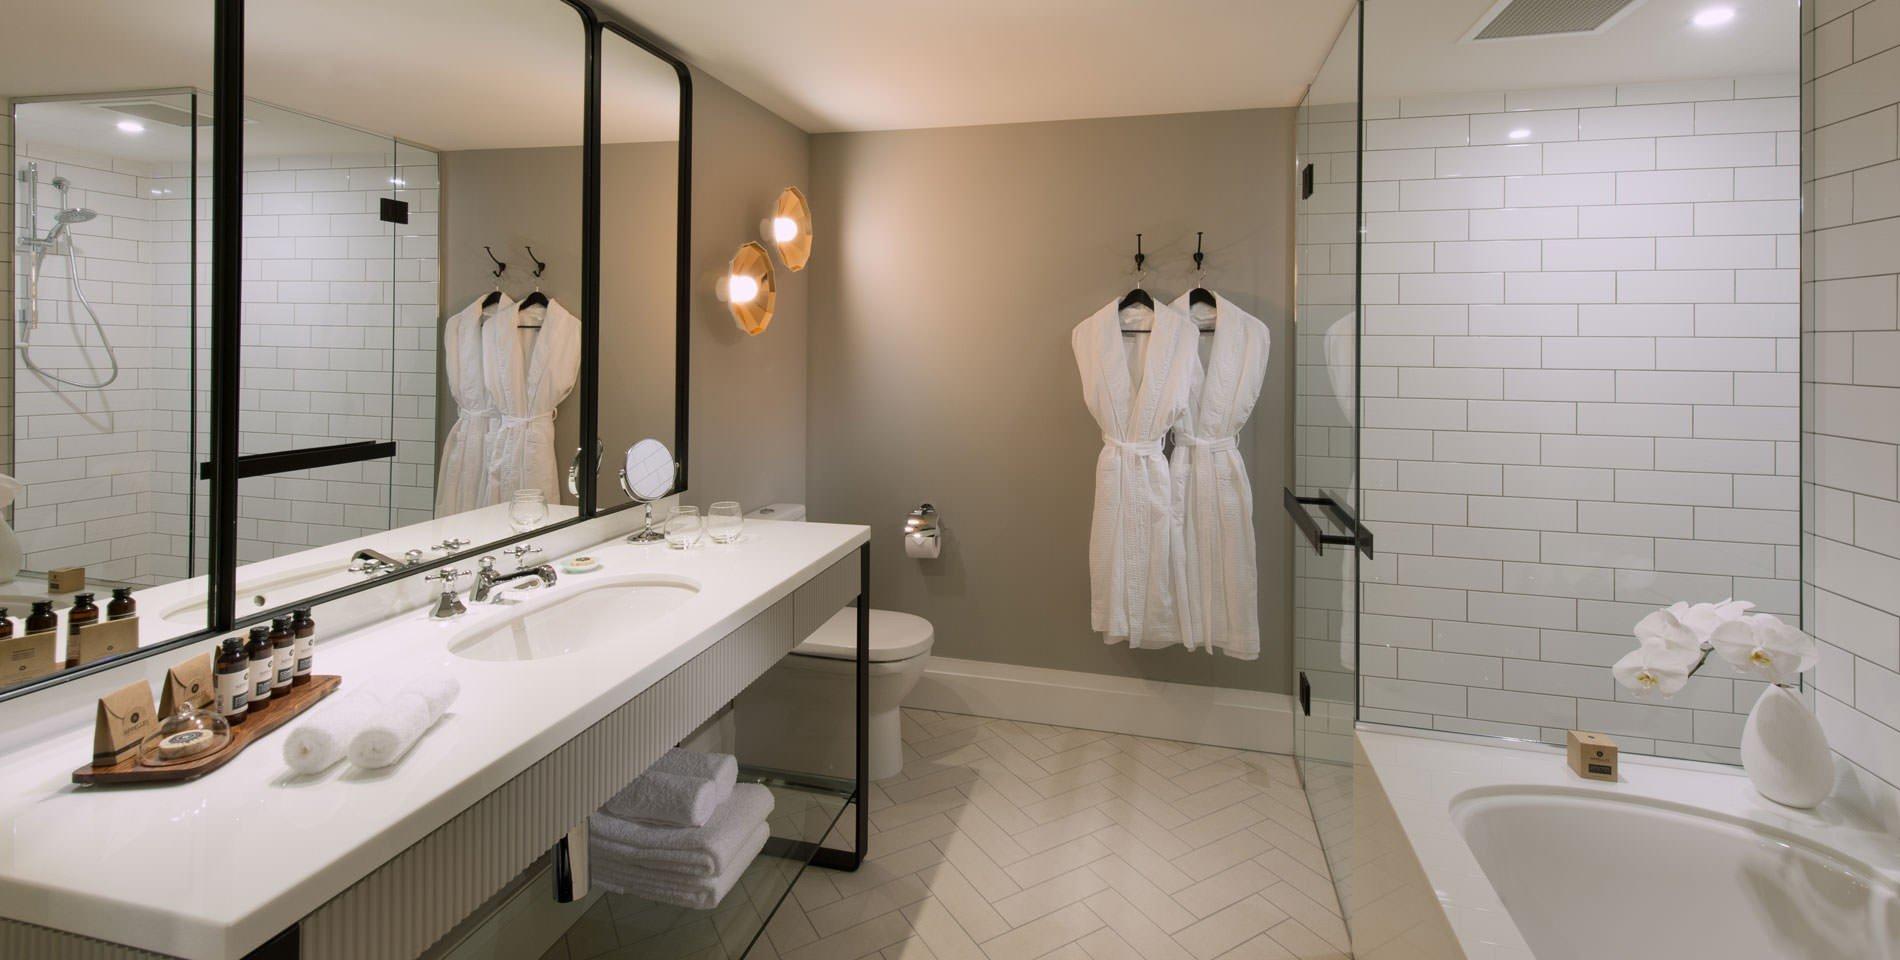 banheiro hotel prego e martelo